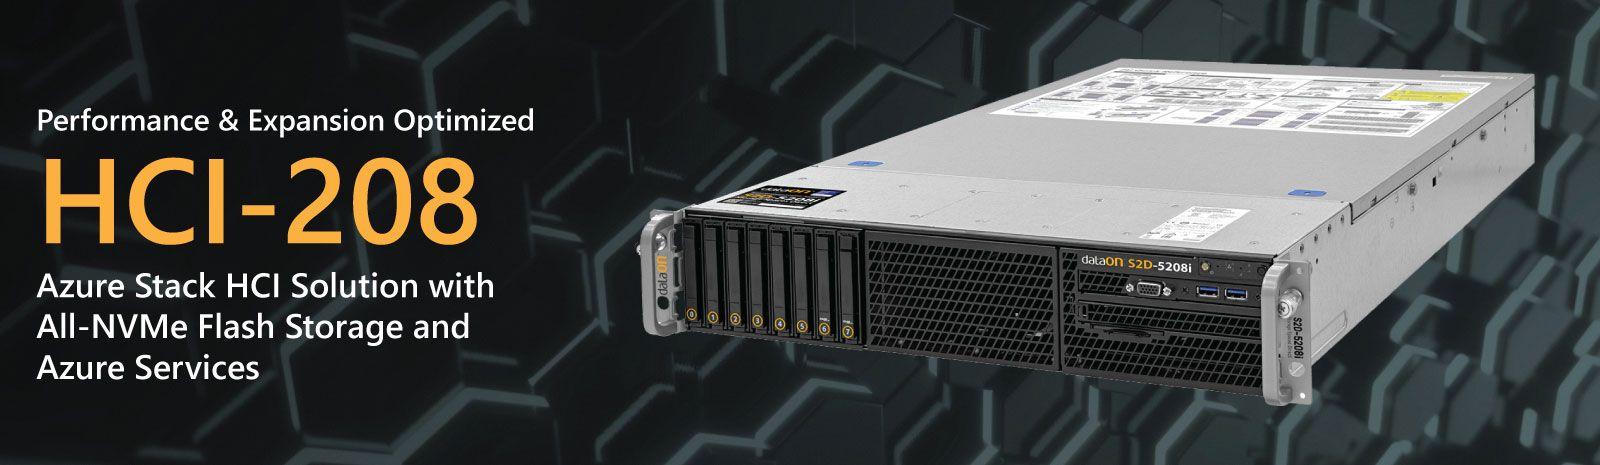 DataON HCI-208: Validated Microsoft Azure Stack HCI Solution